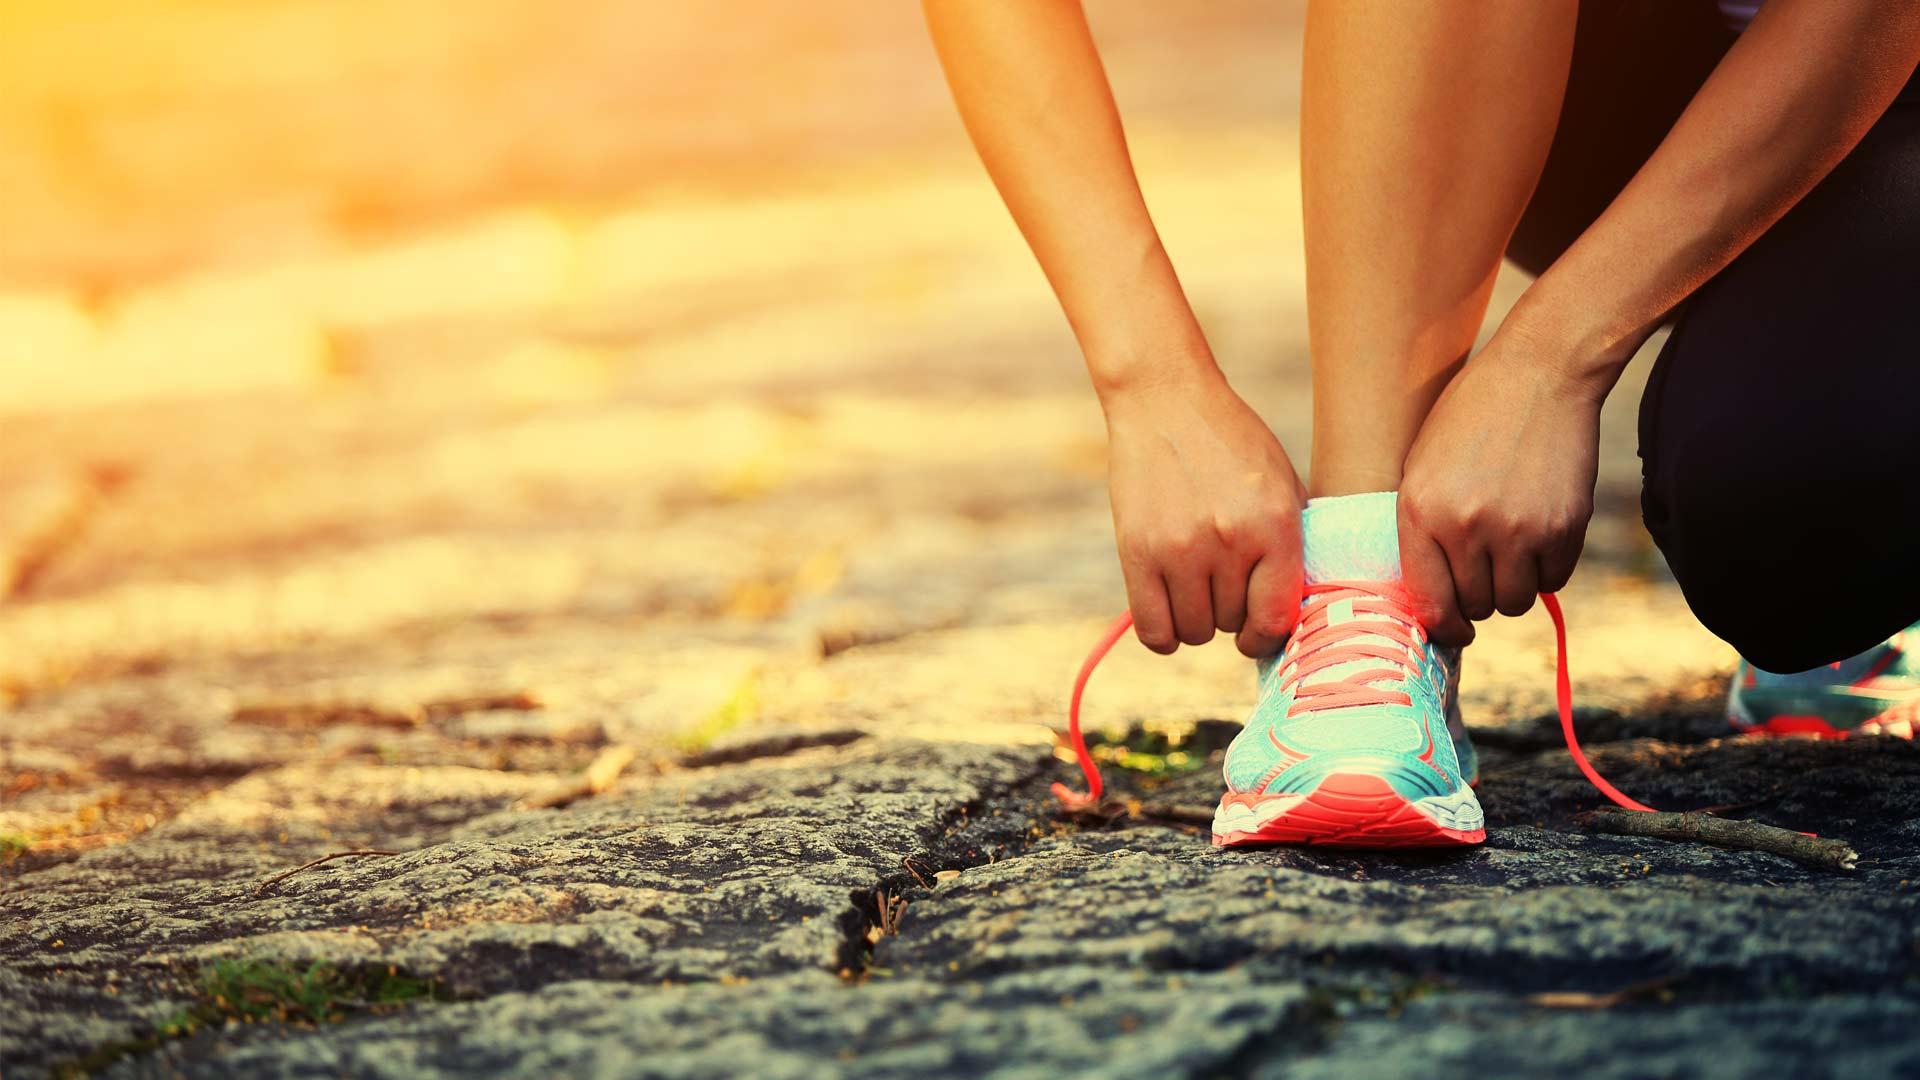 Blog langzaam trainen om sneller hard te lopen Podotherapie Couteaux